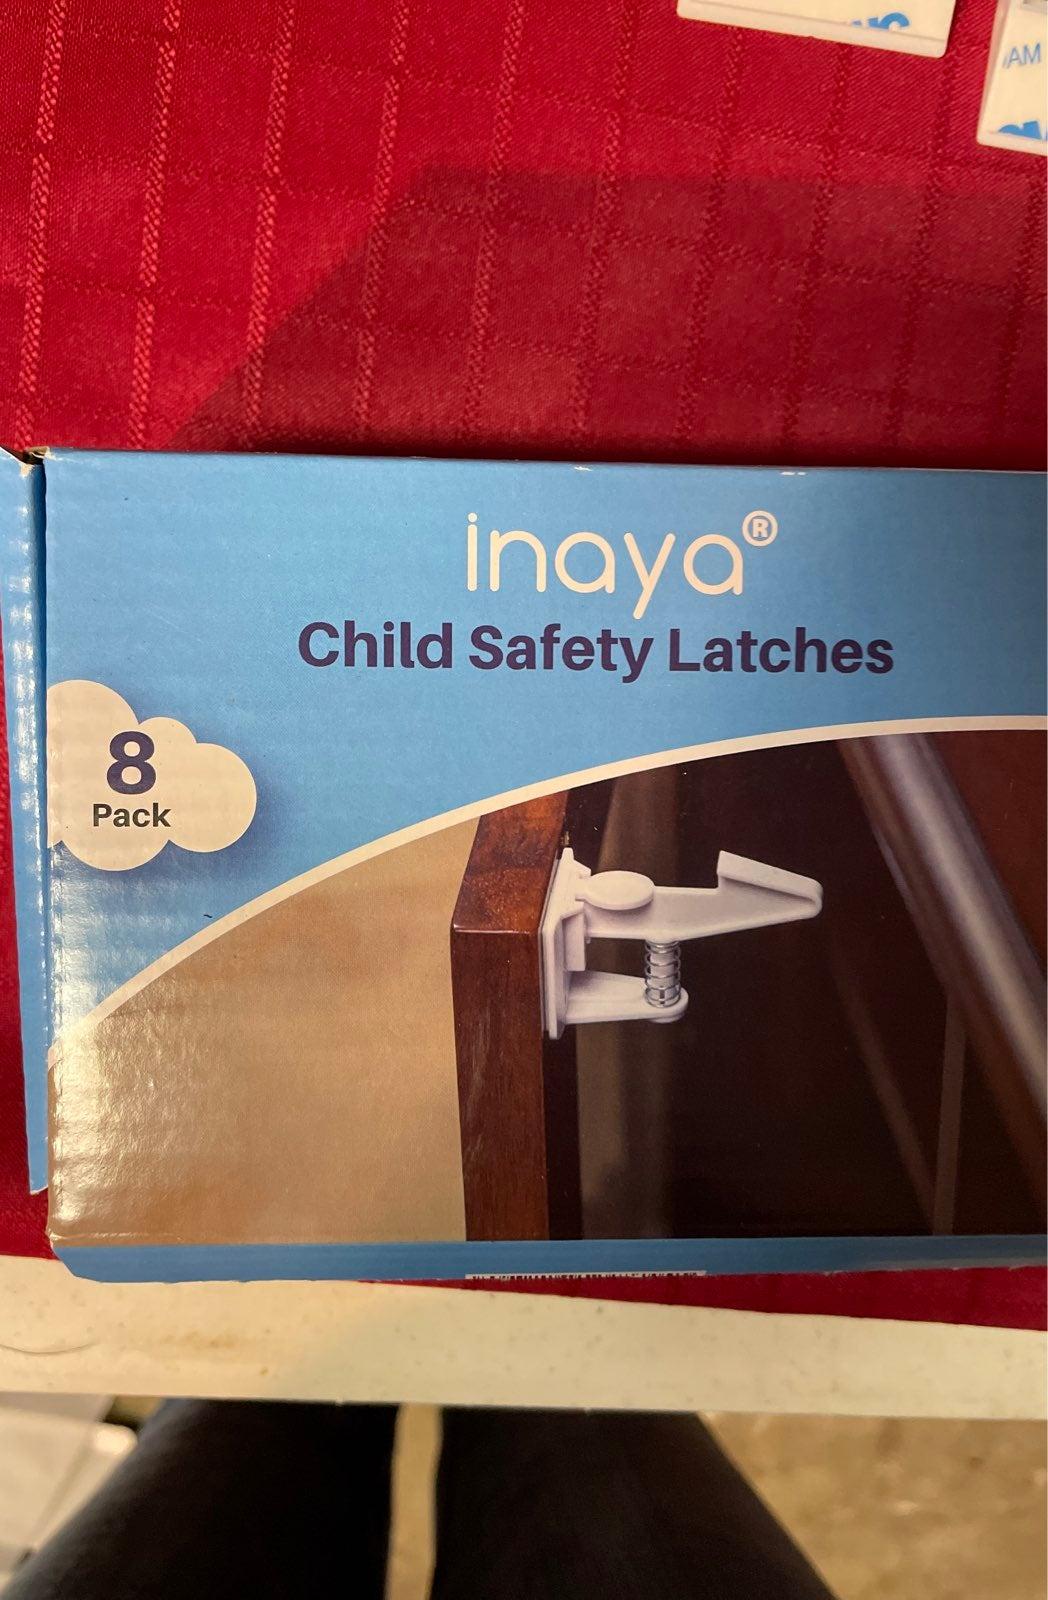 Child safty latches